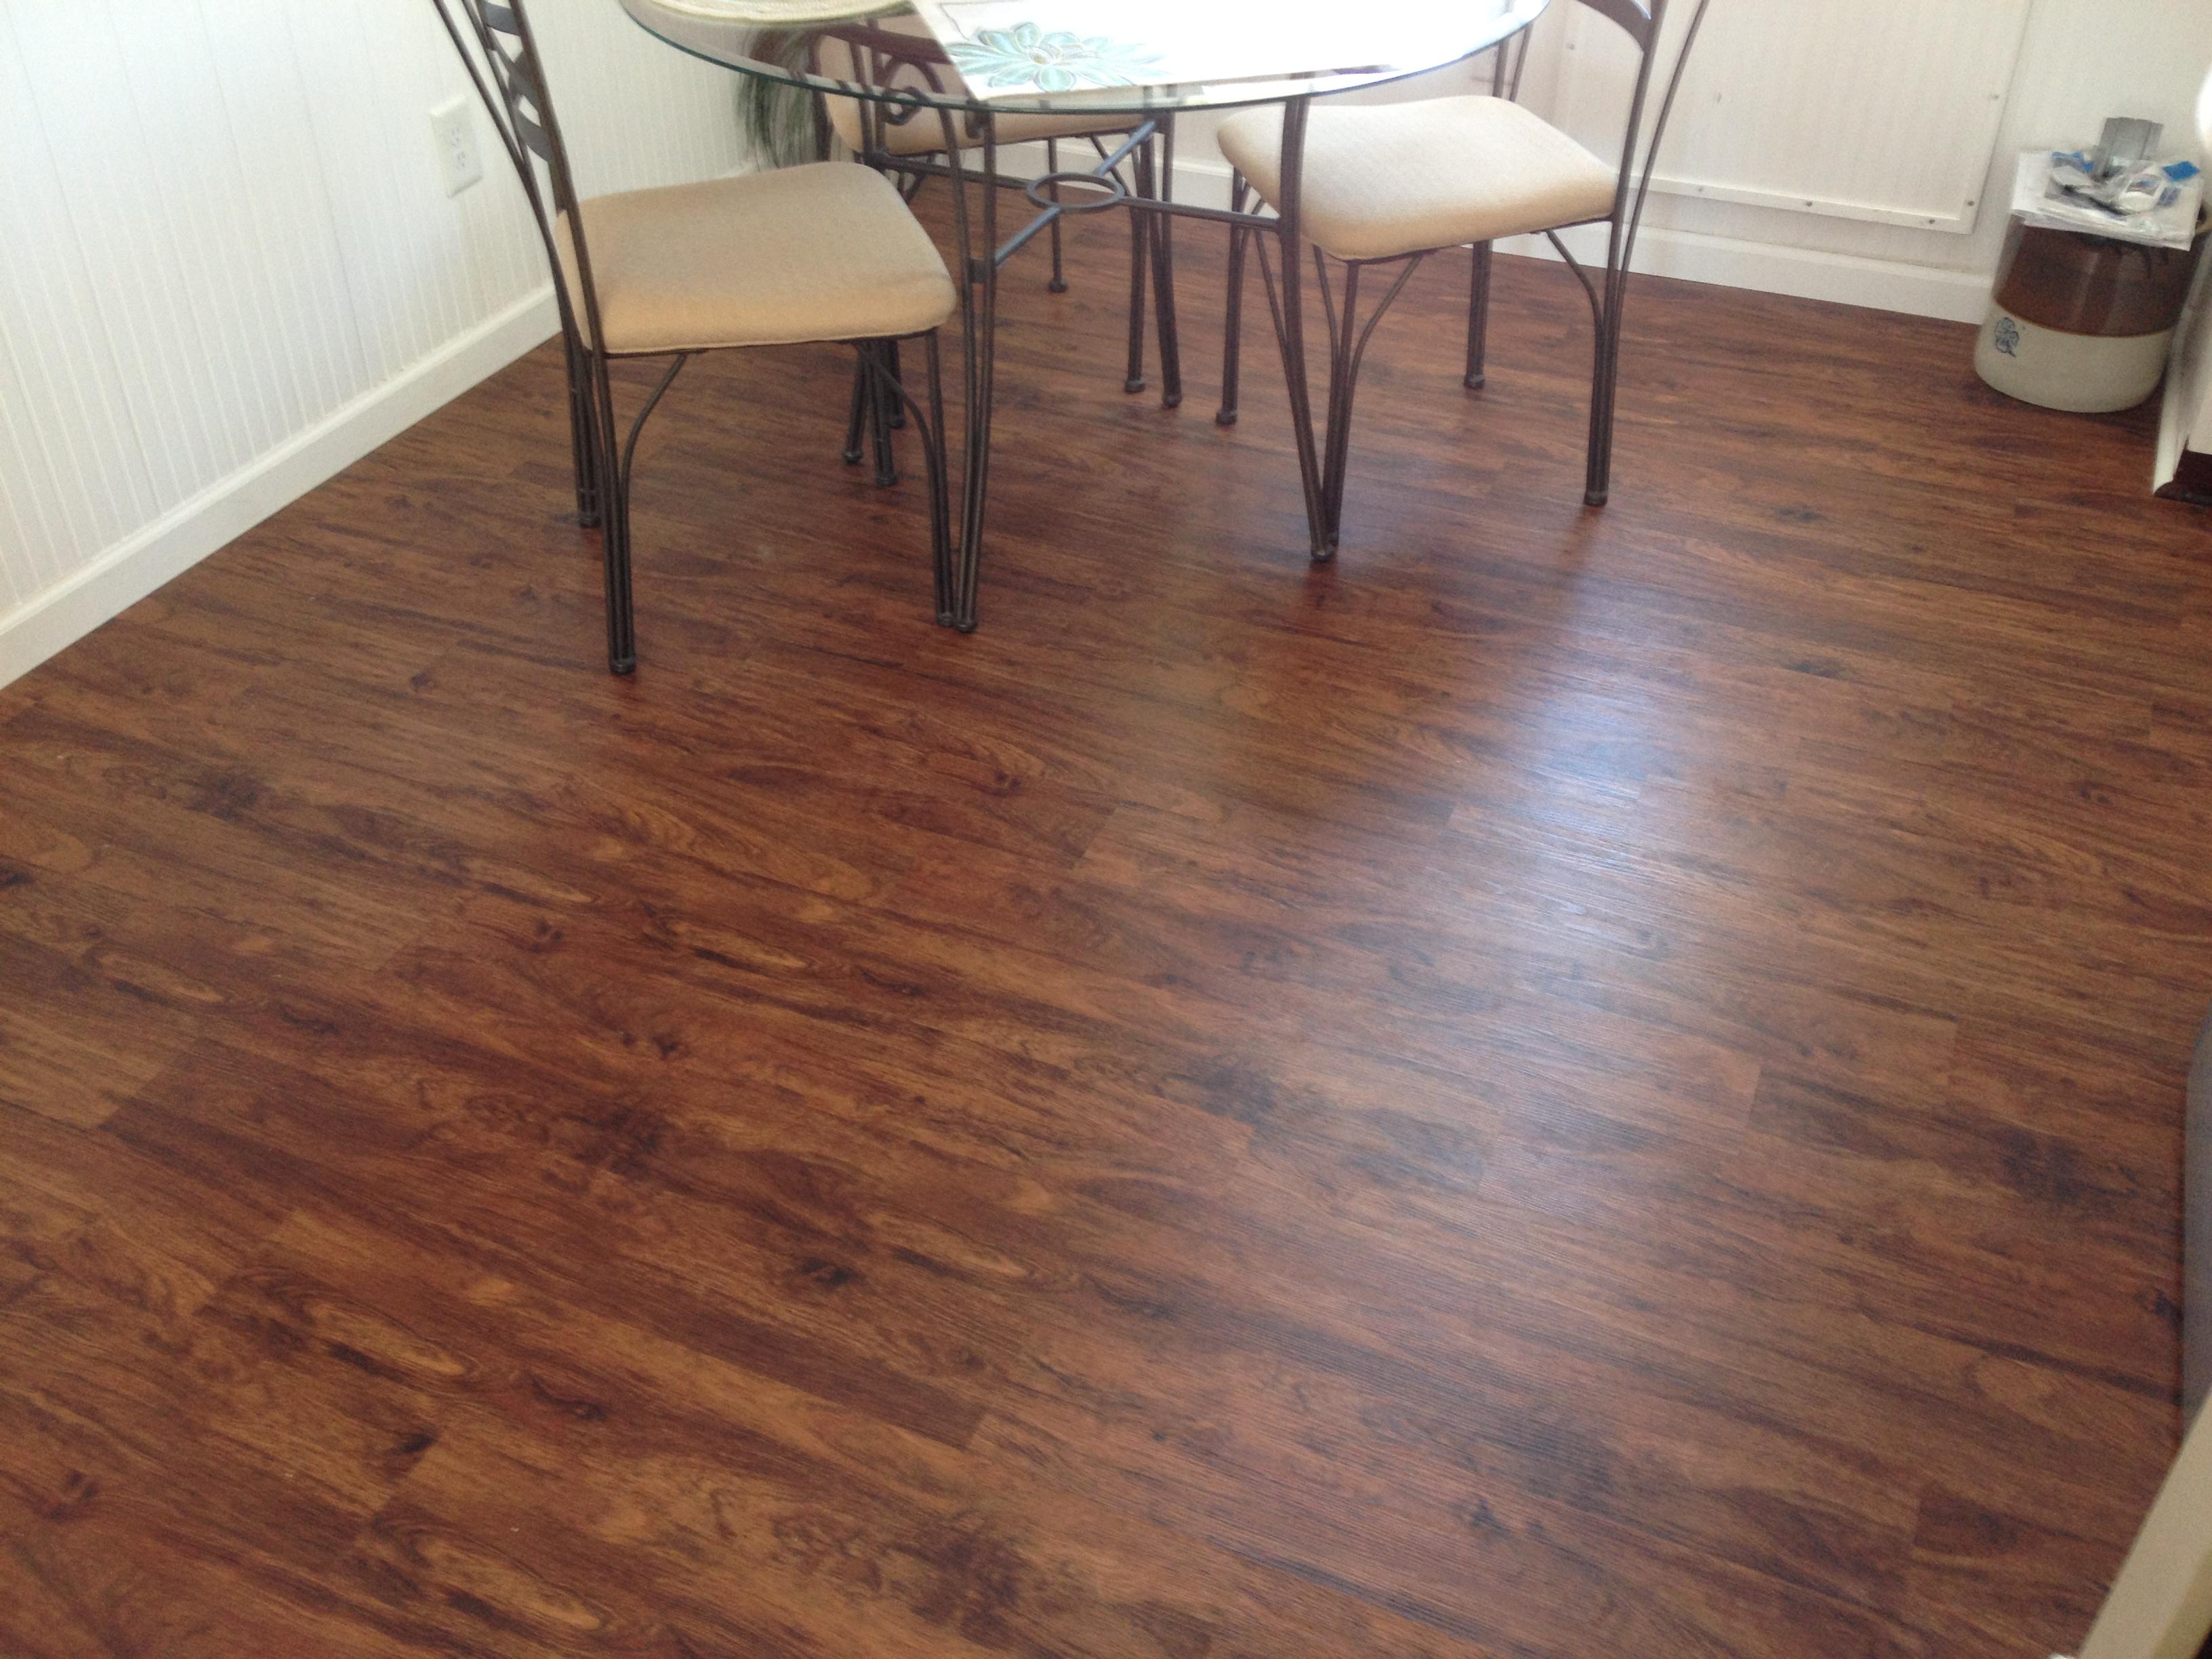 Menards designers image mocha walnut Plank flooring